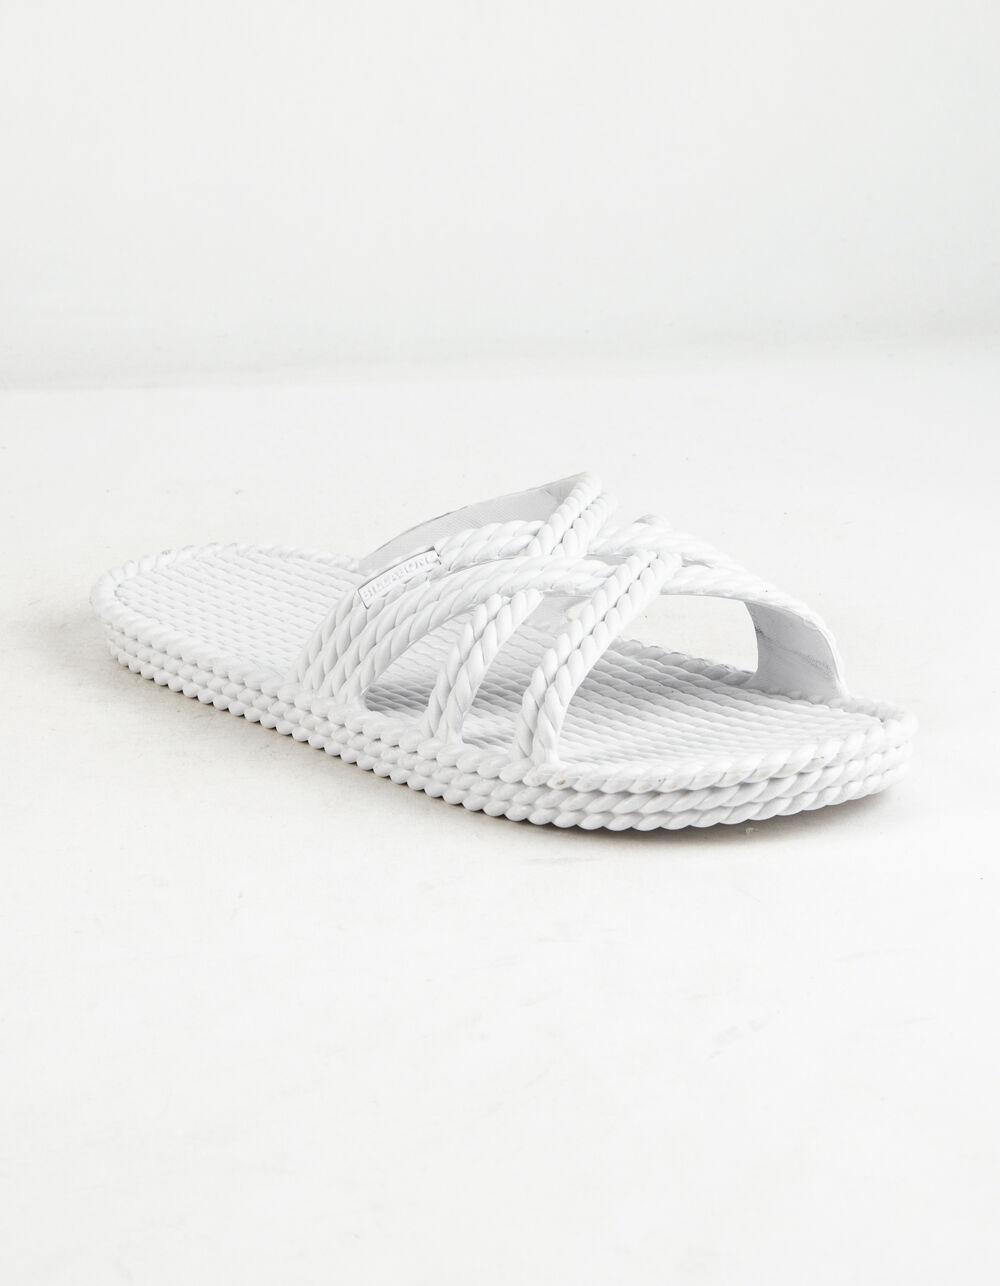 BILLABONG Slippin Slide White Sandals